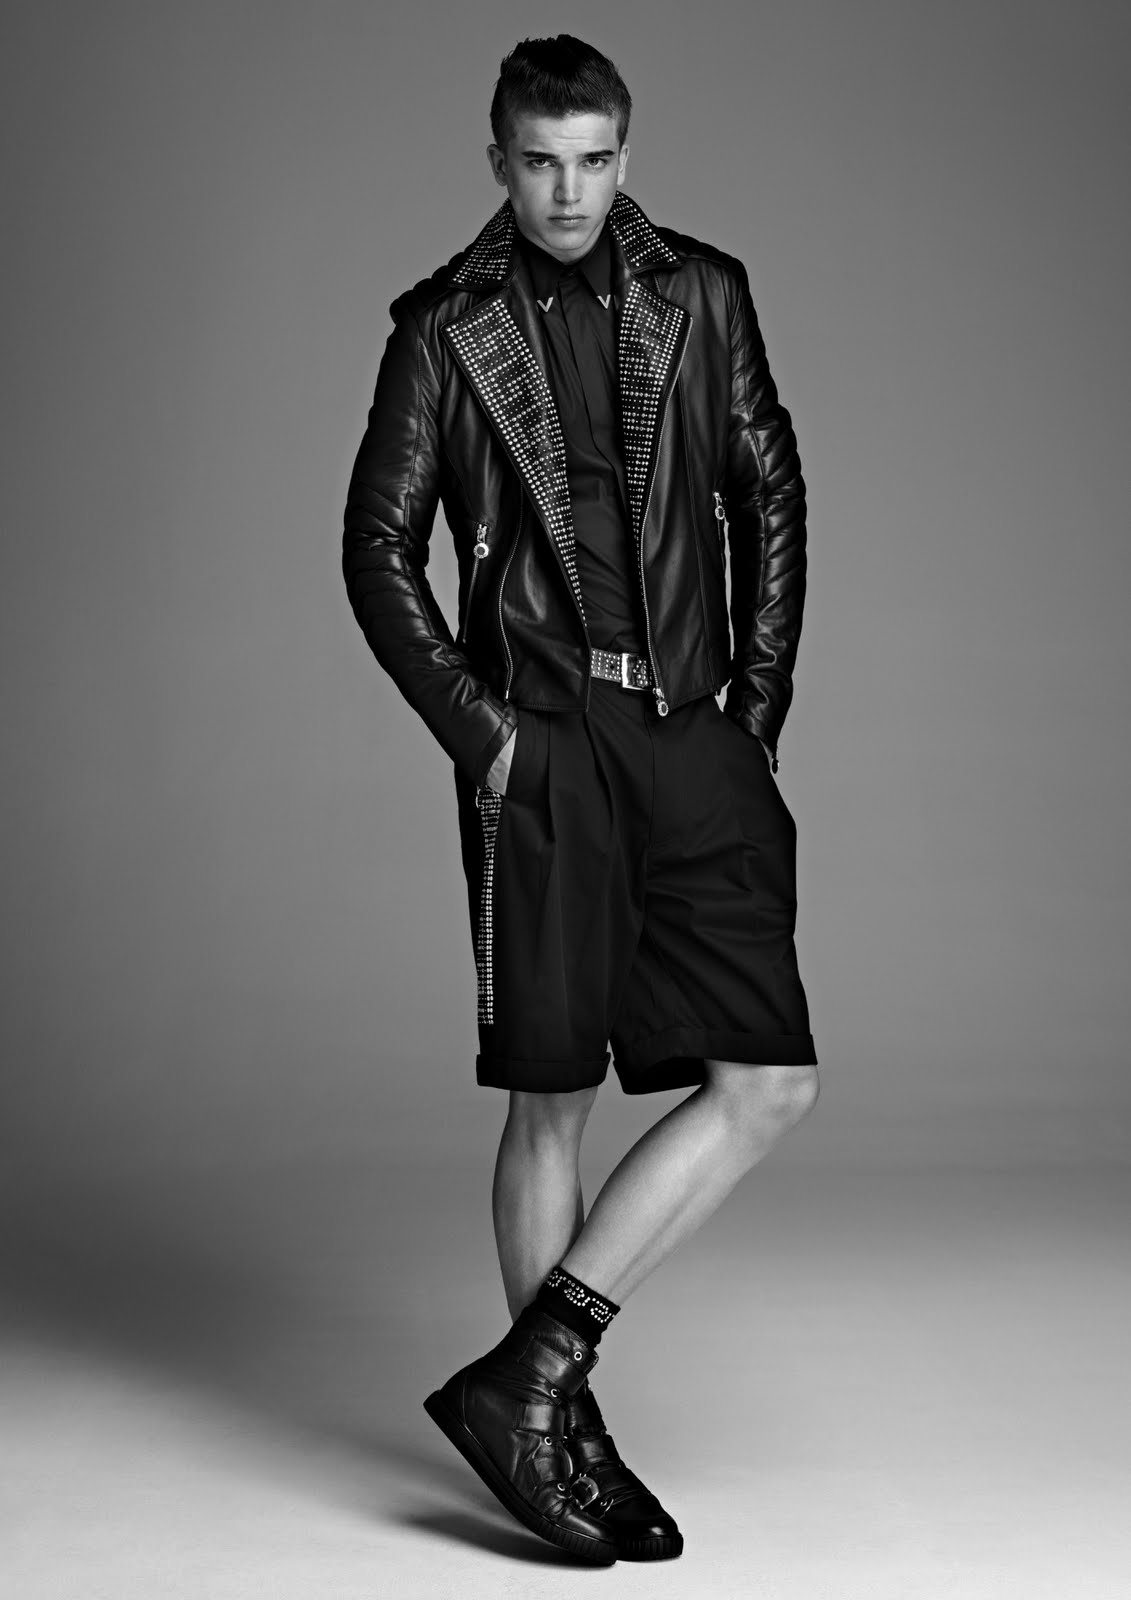 Versace Men 2015 Spring Summer: River Viiperi For Versace For H&M Men's